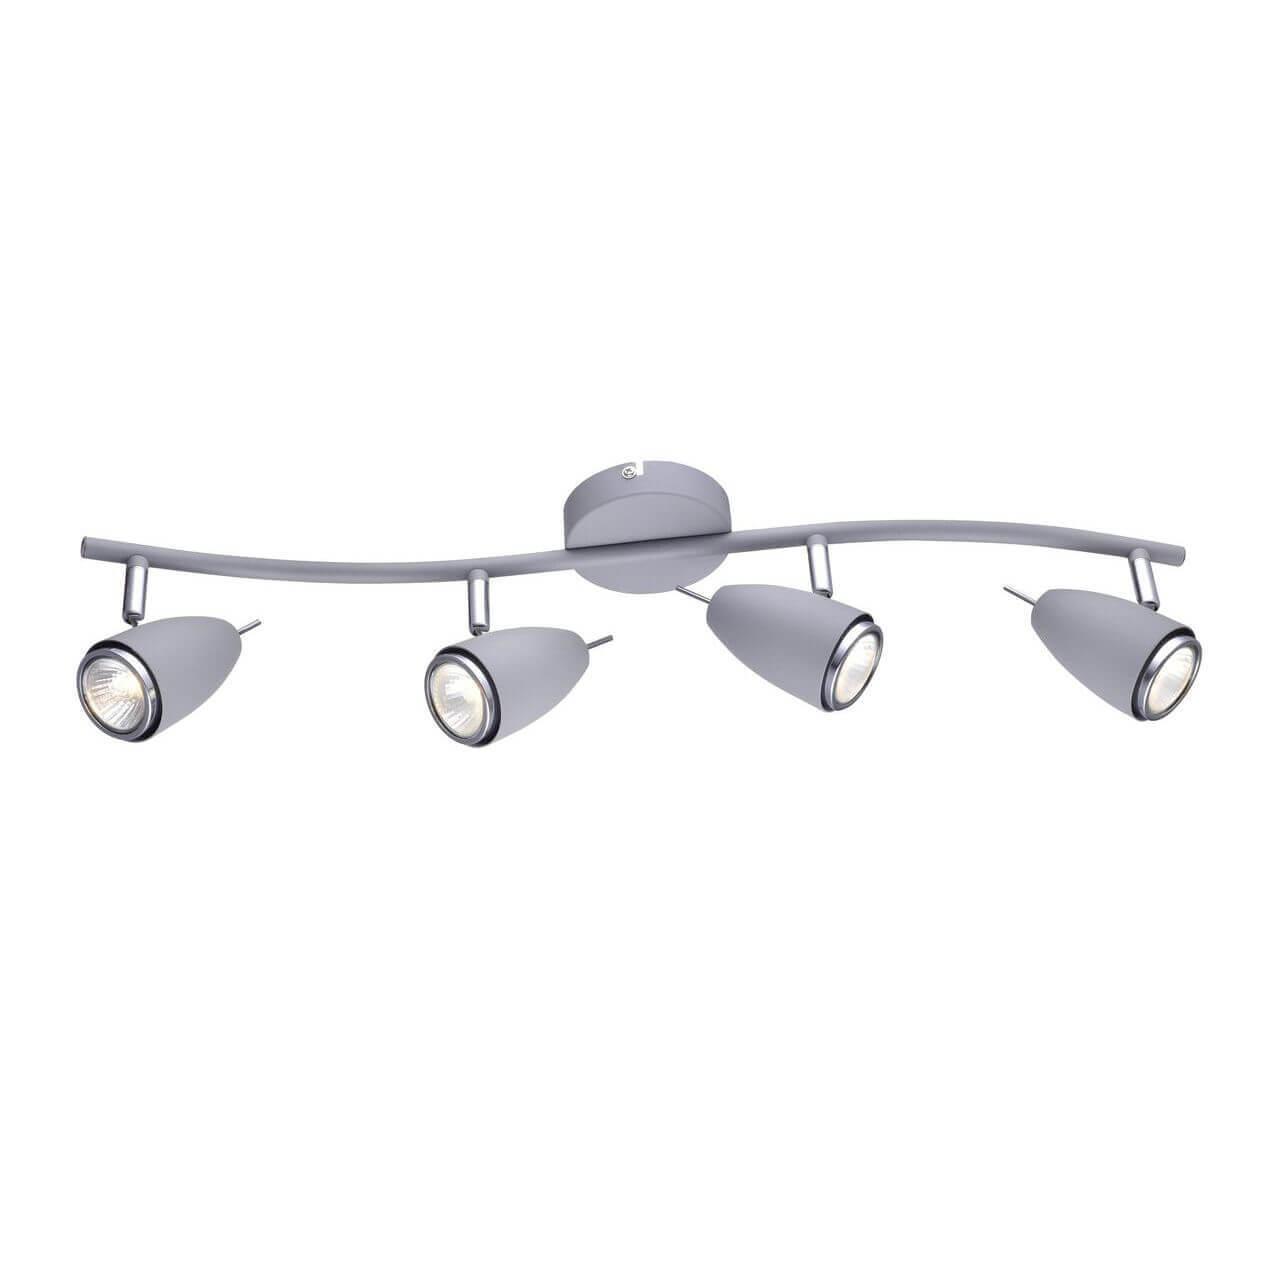 Спот Arte Lamp A1966PL-4GY Regista